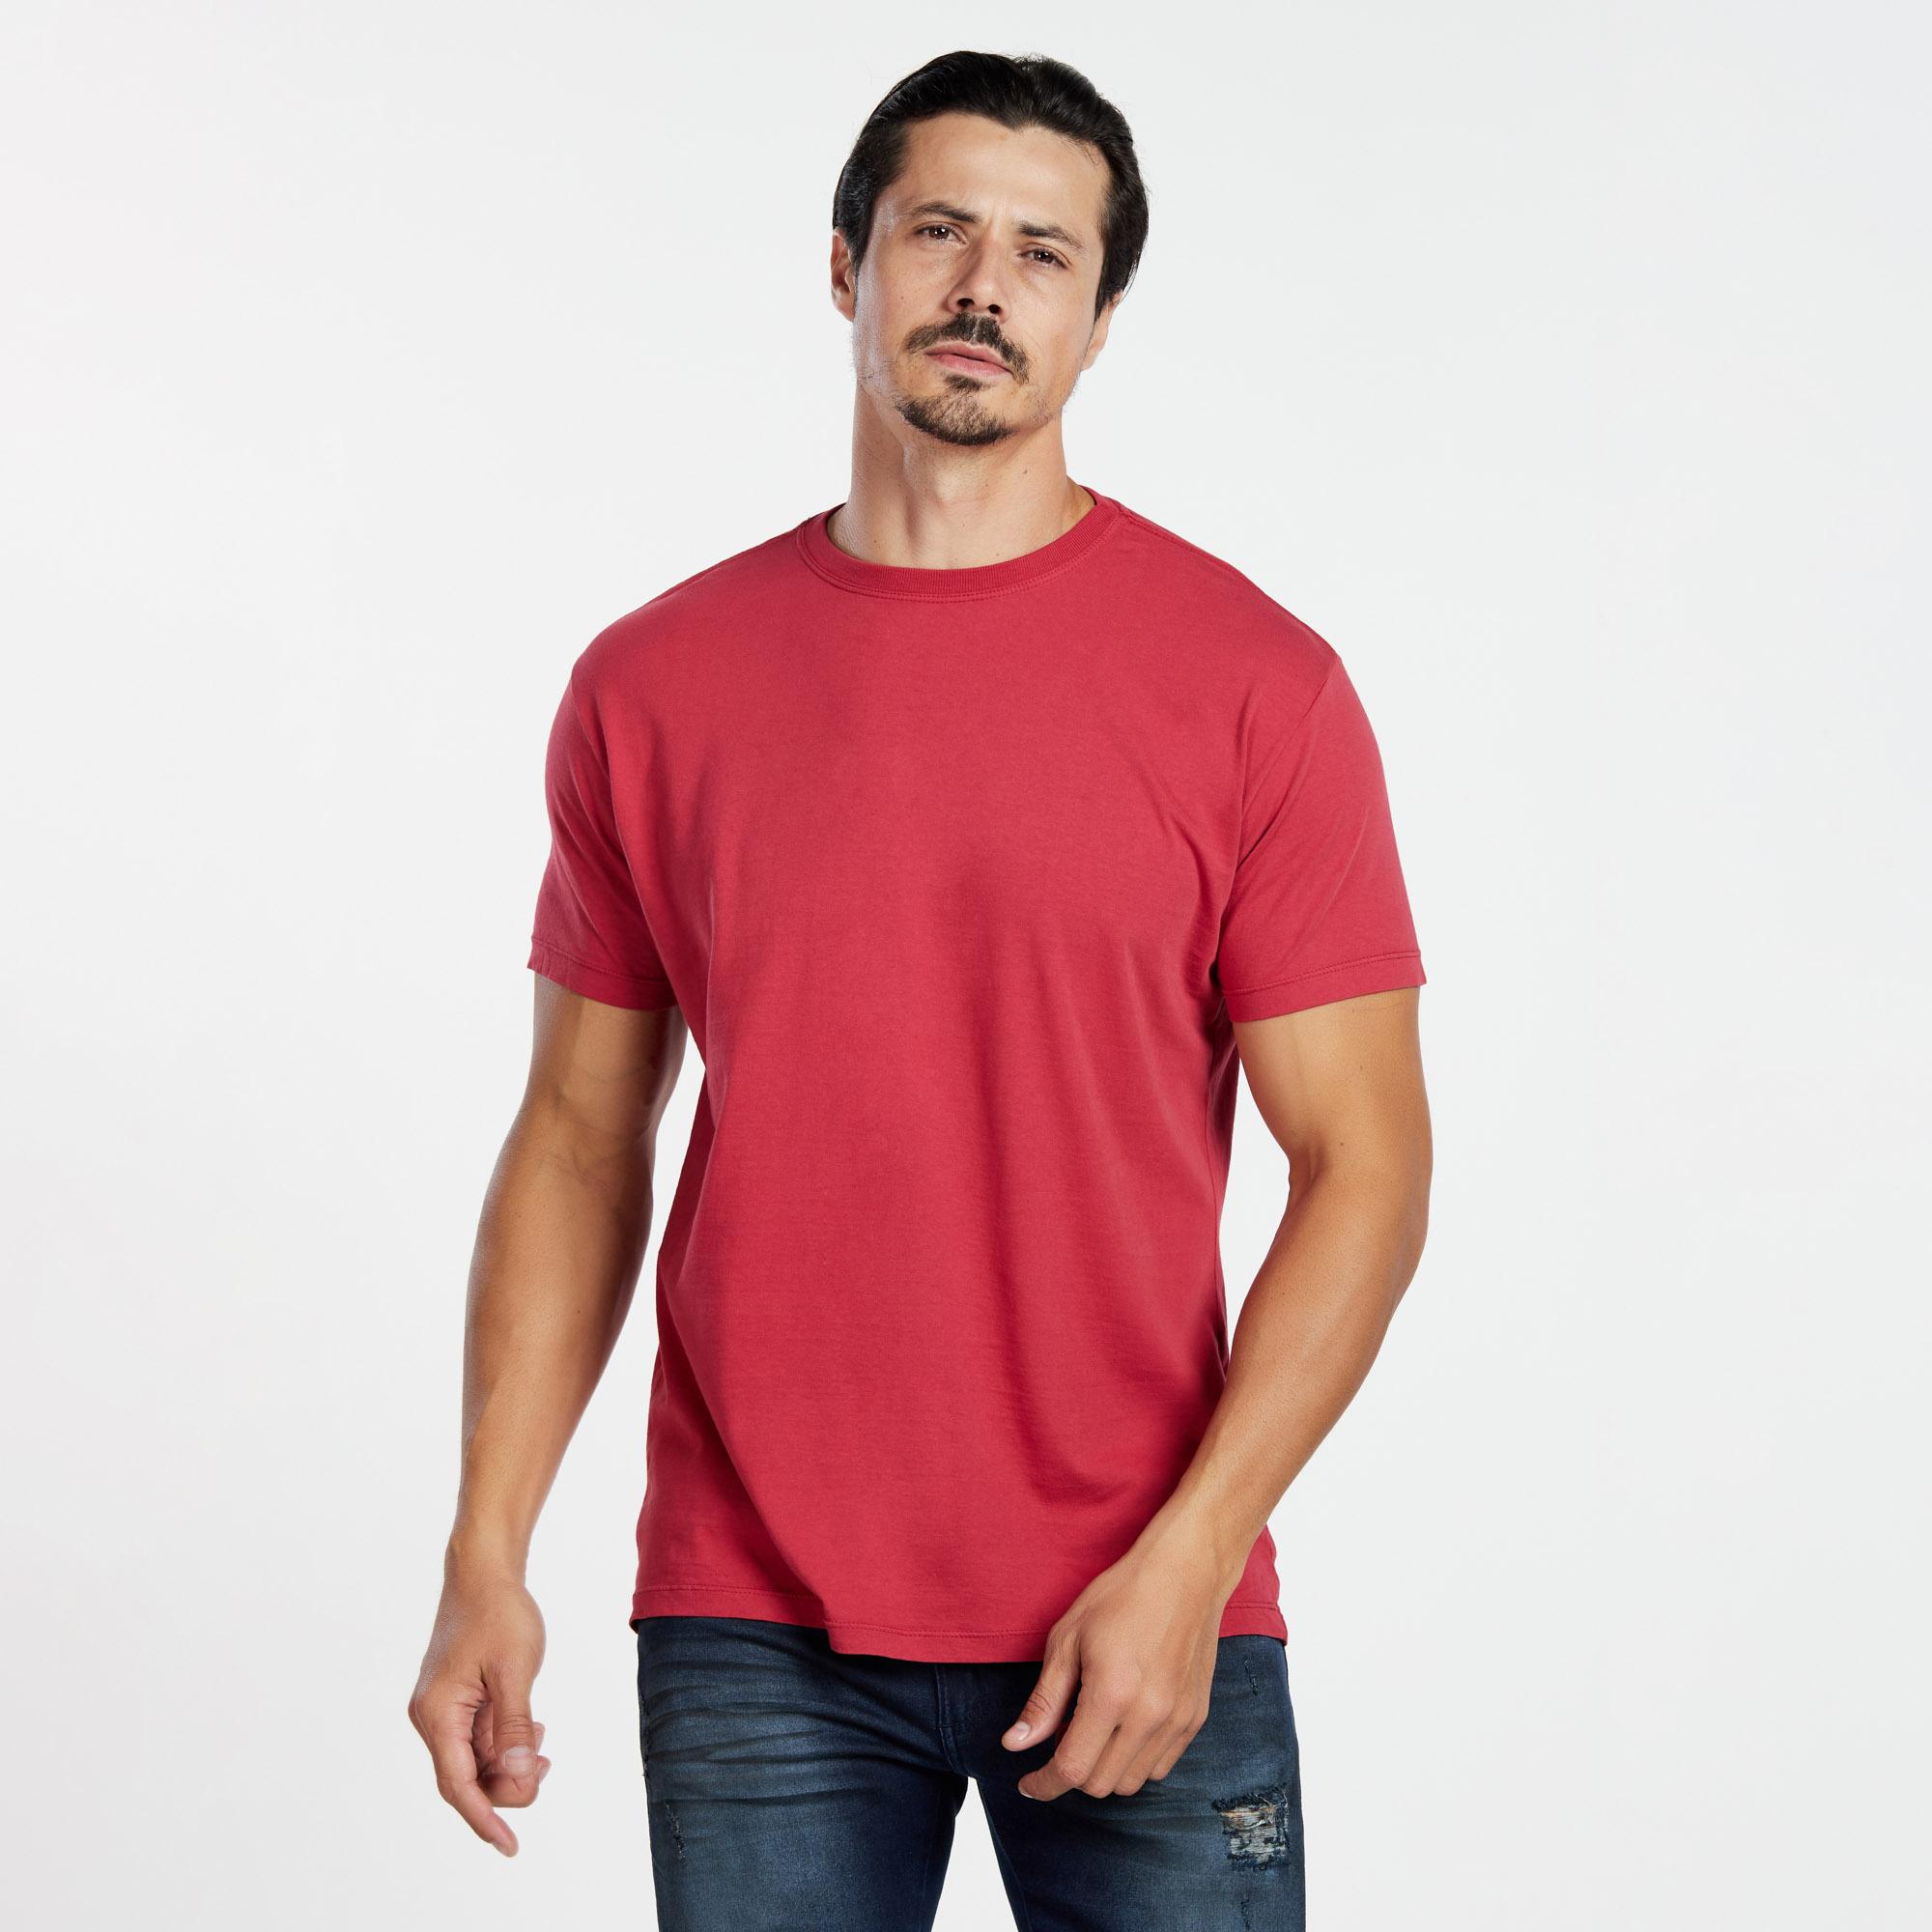 Camiseta Masculina Reativo Cereja